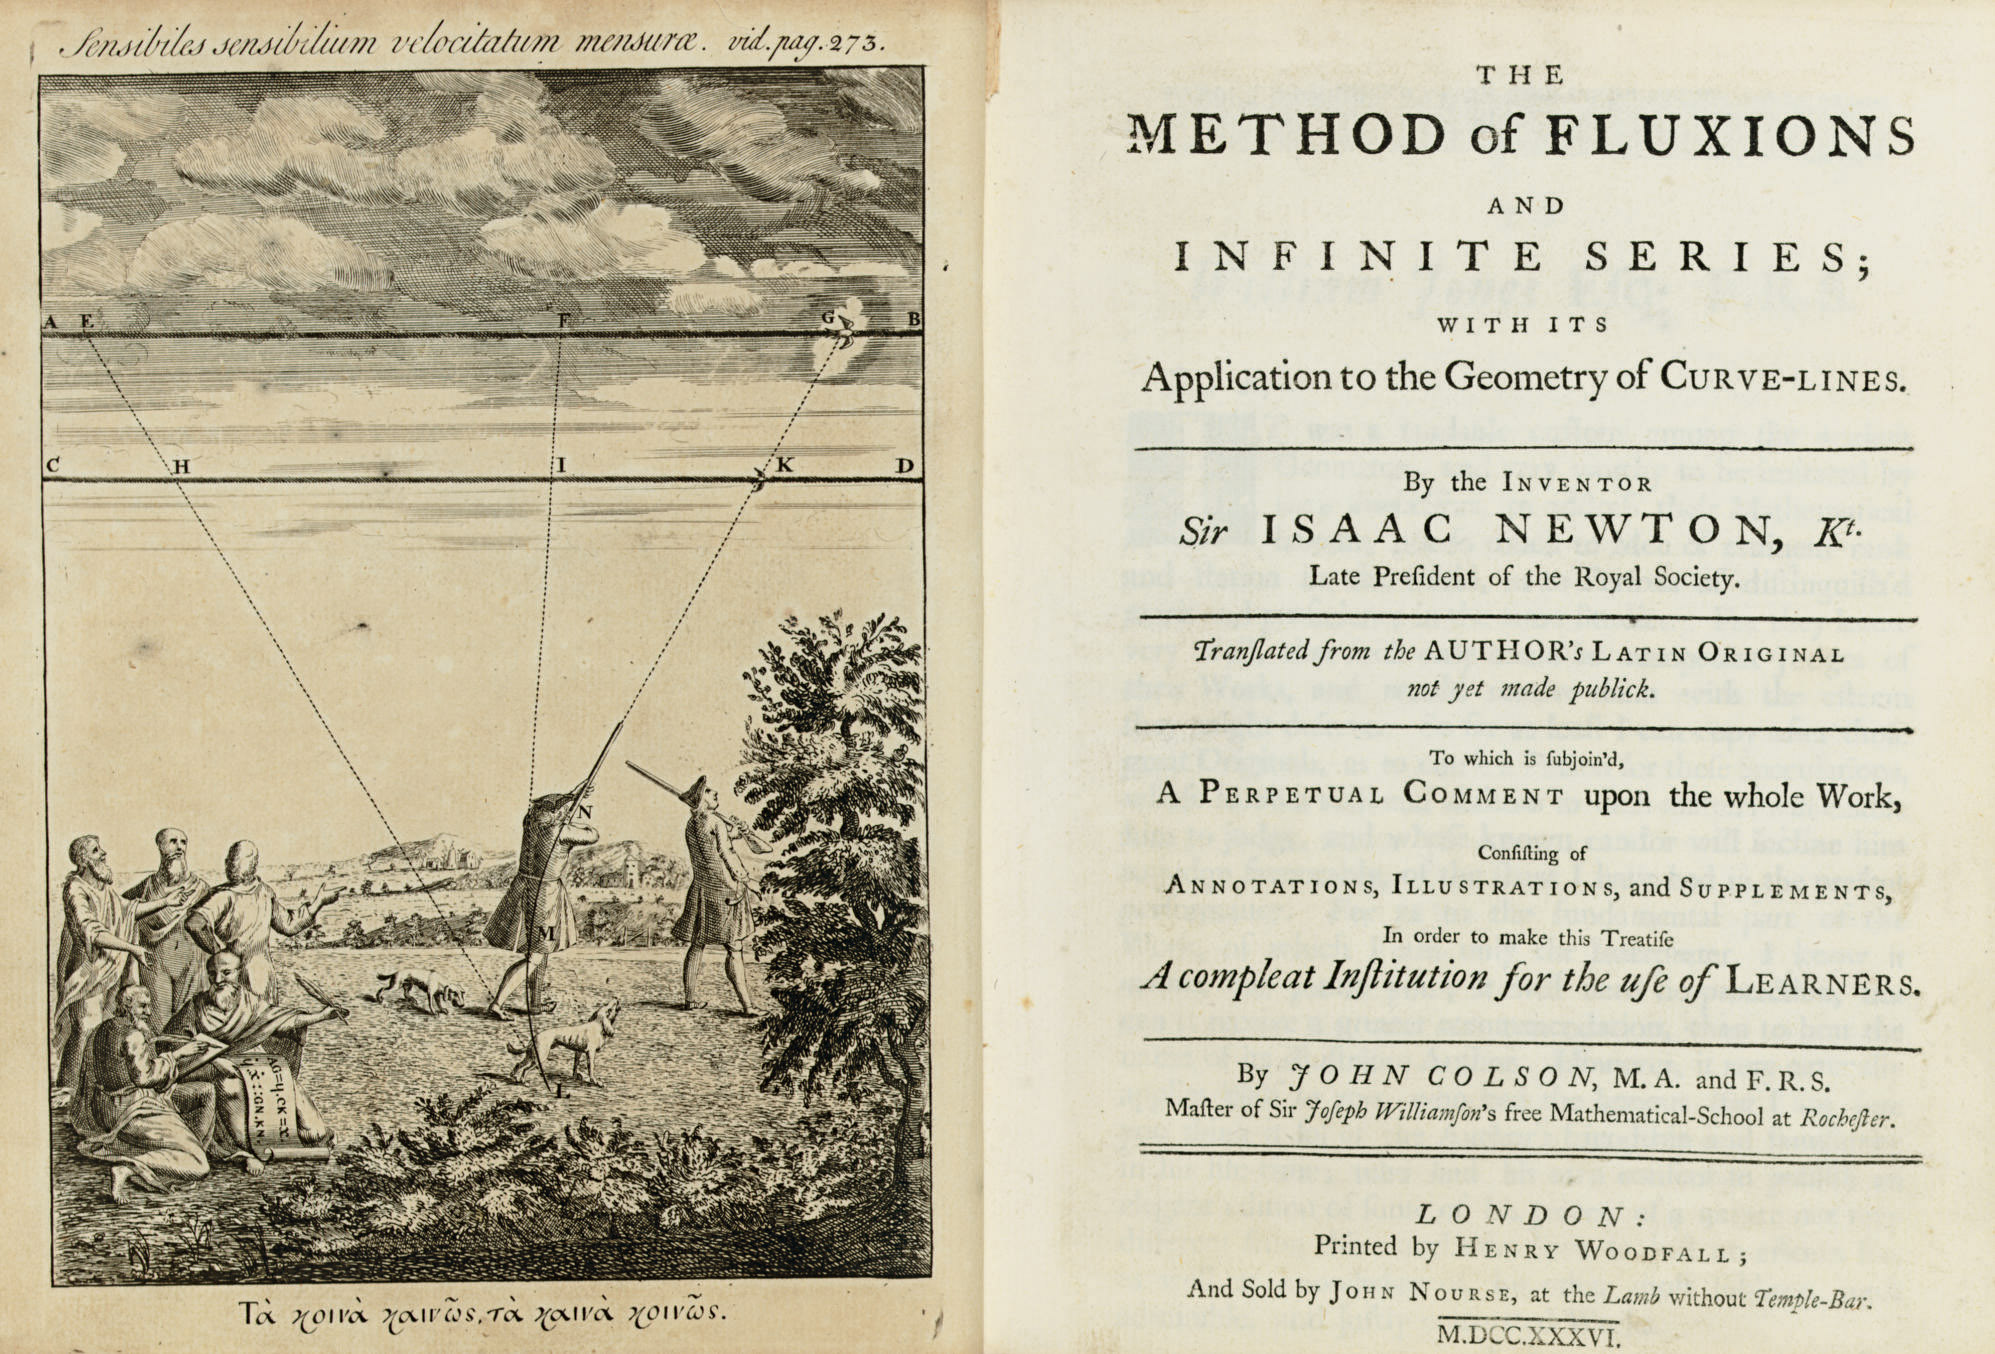 NEWTON, Sir Isaac. The Method